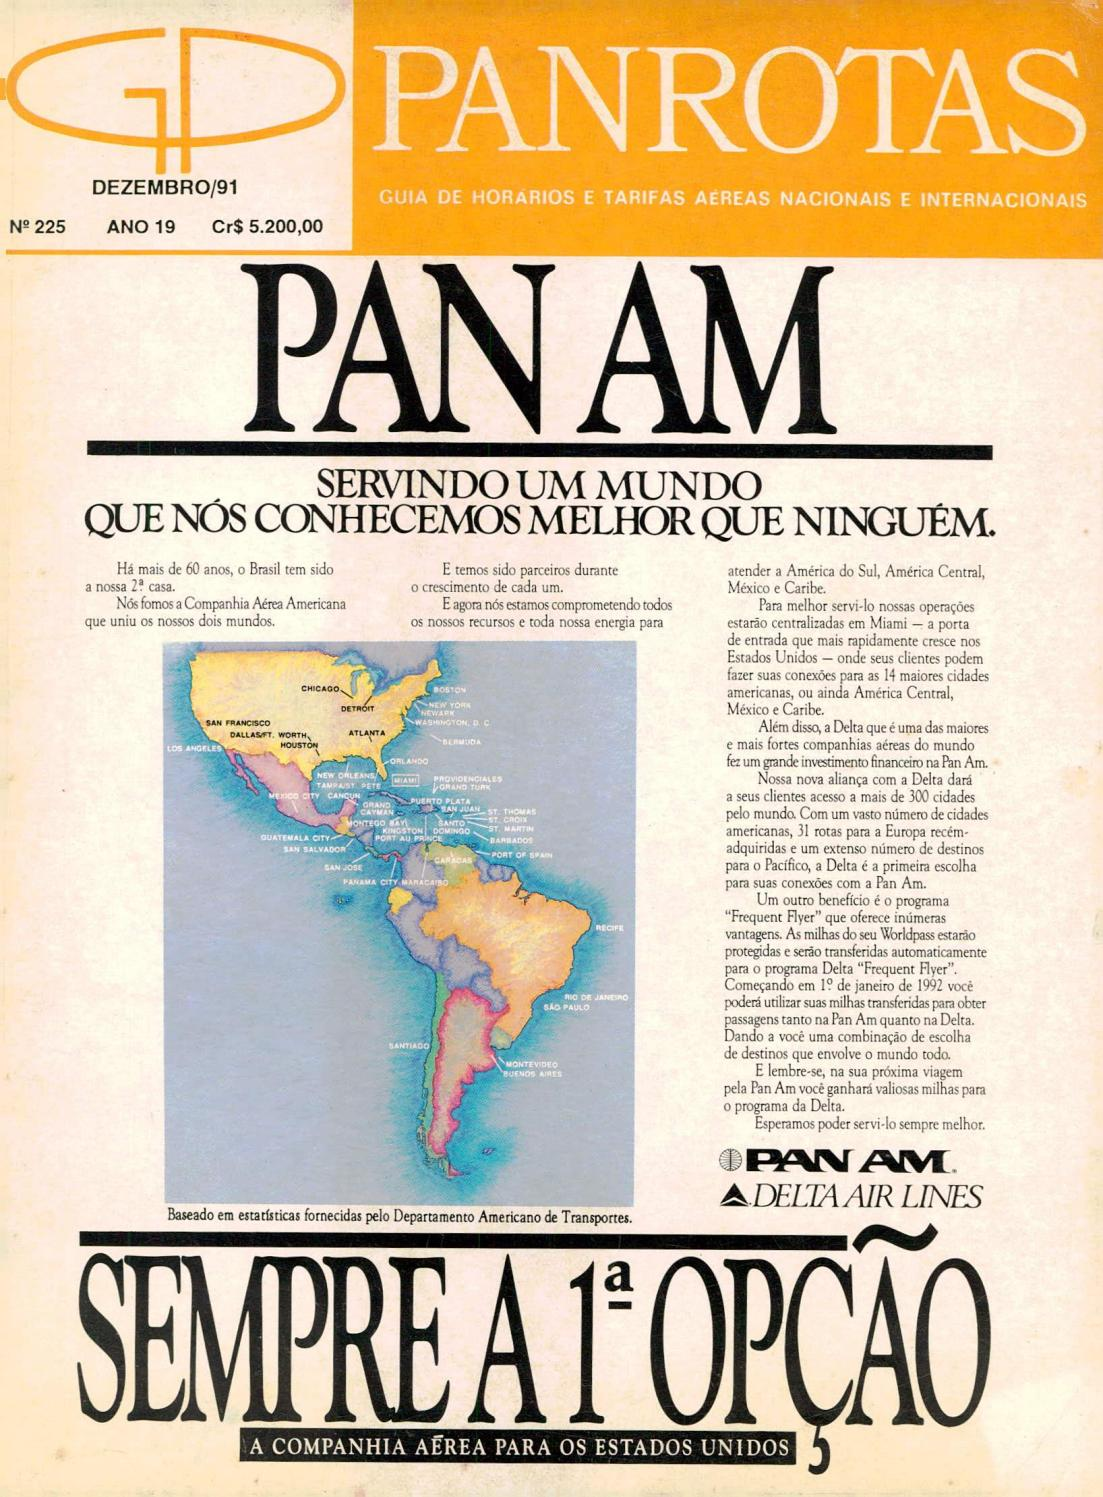 Menu Reveillon De Noel Cora.Guia Panrotas Edicao 225 Dezembro 1991 By Panrotas